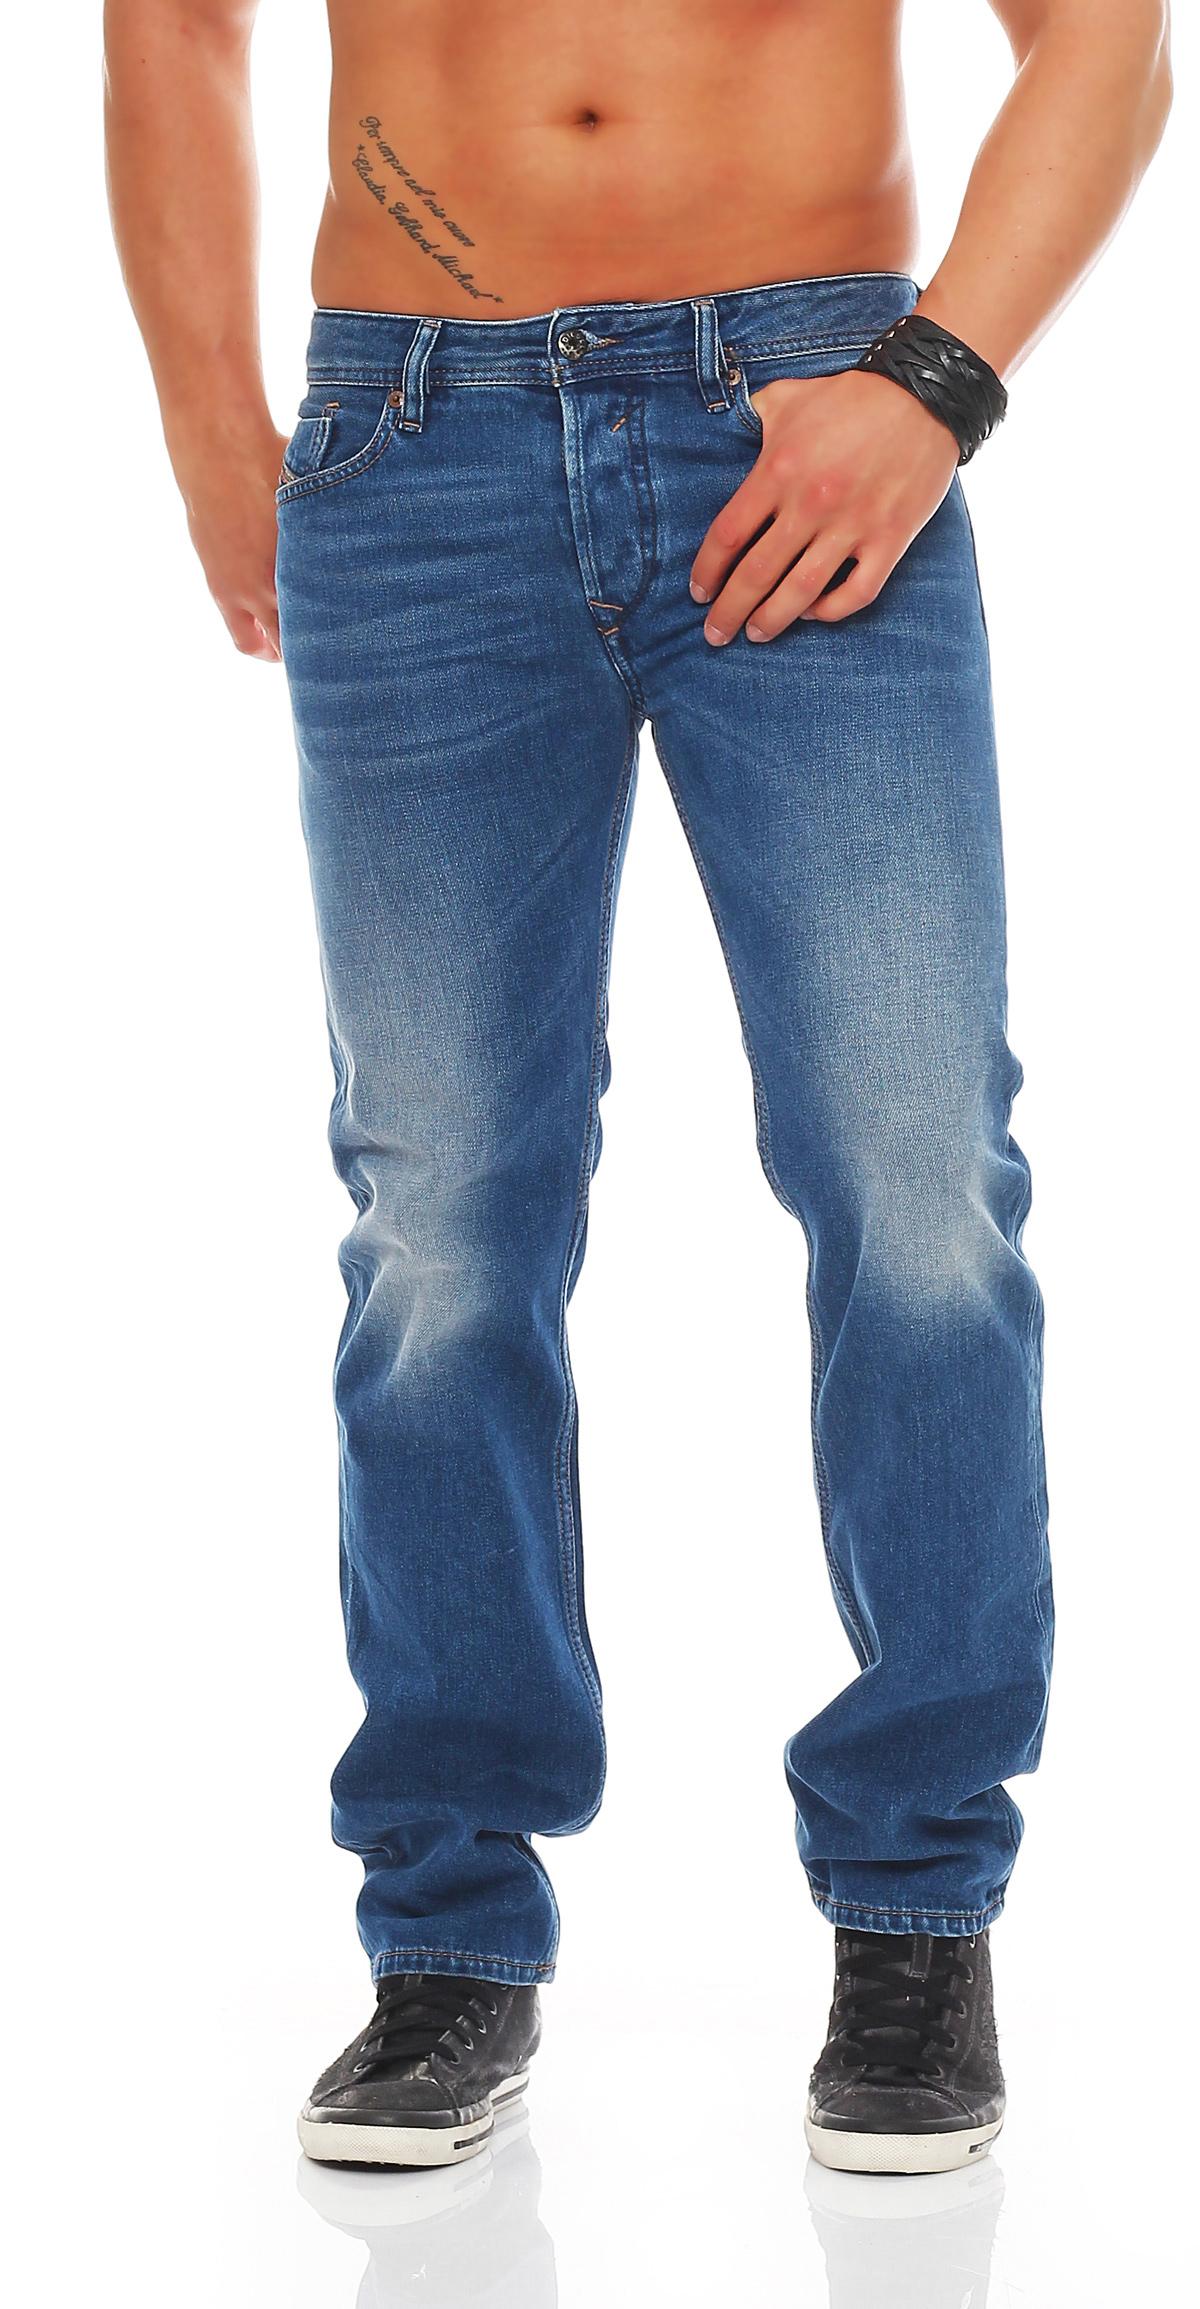 diesel jeans waykee 0823c 823c homme coupe droite regular. Black Bedroom Furniture Sets. Home Design Ideas